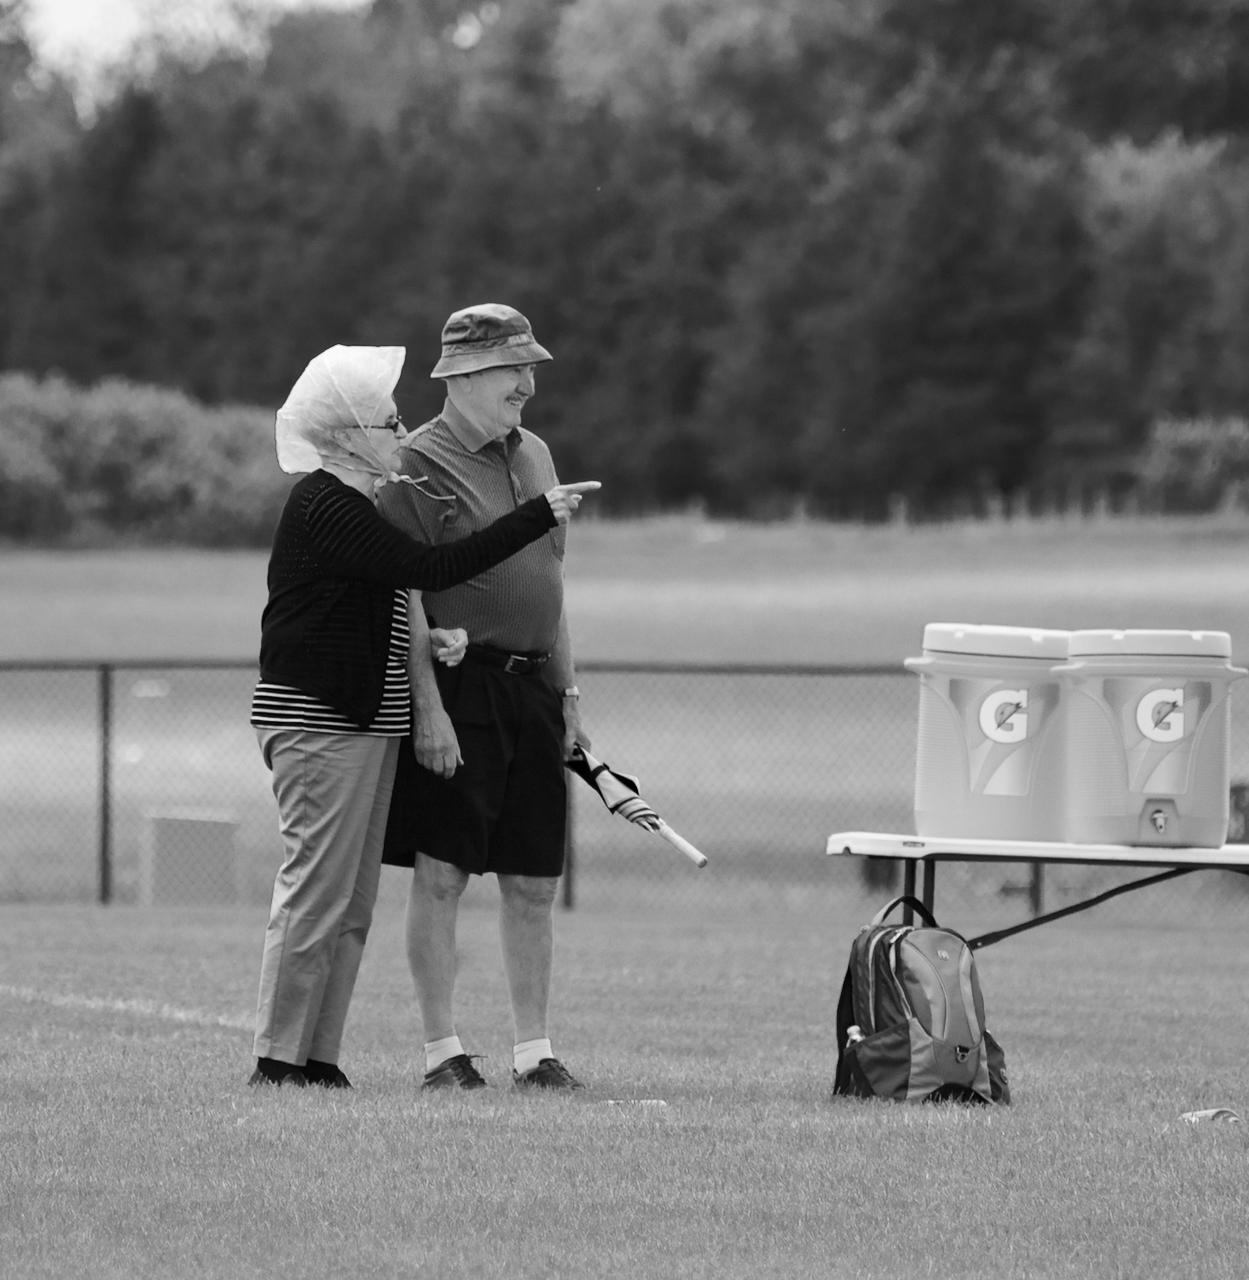 Hats. Sportscore Two. Loves Park, Illinois. June 2017. © William D. Walker